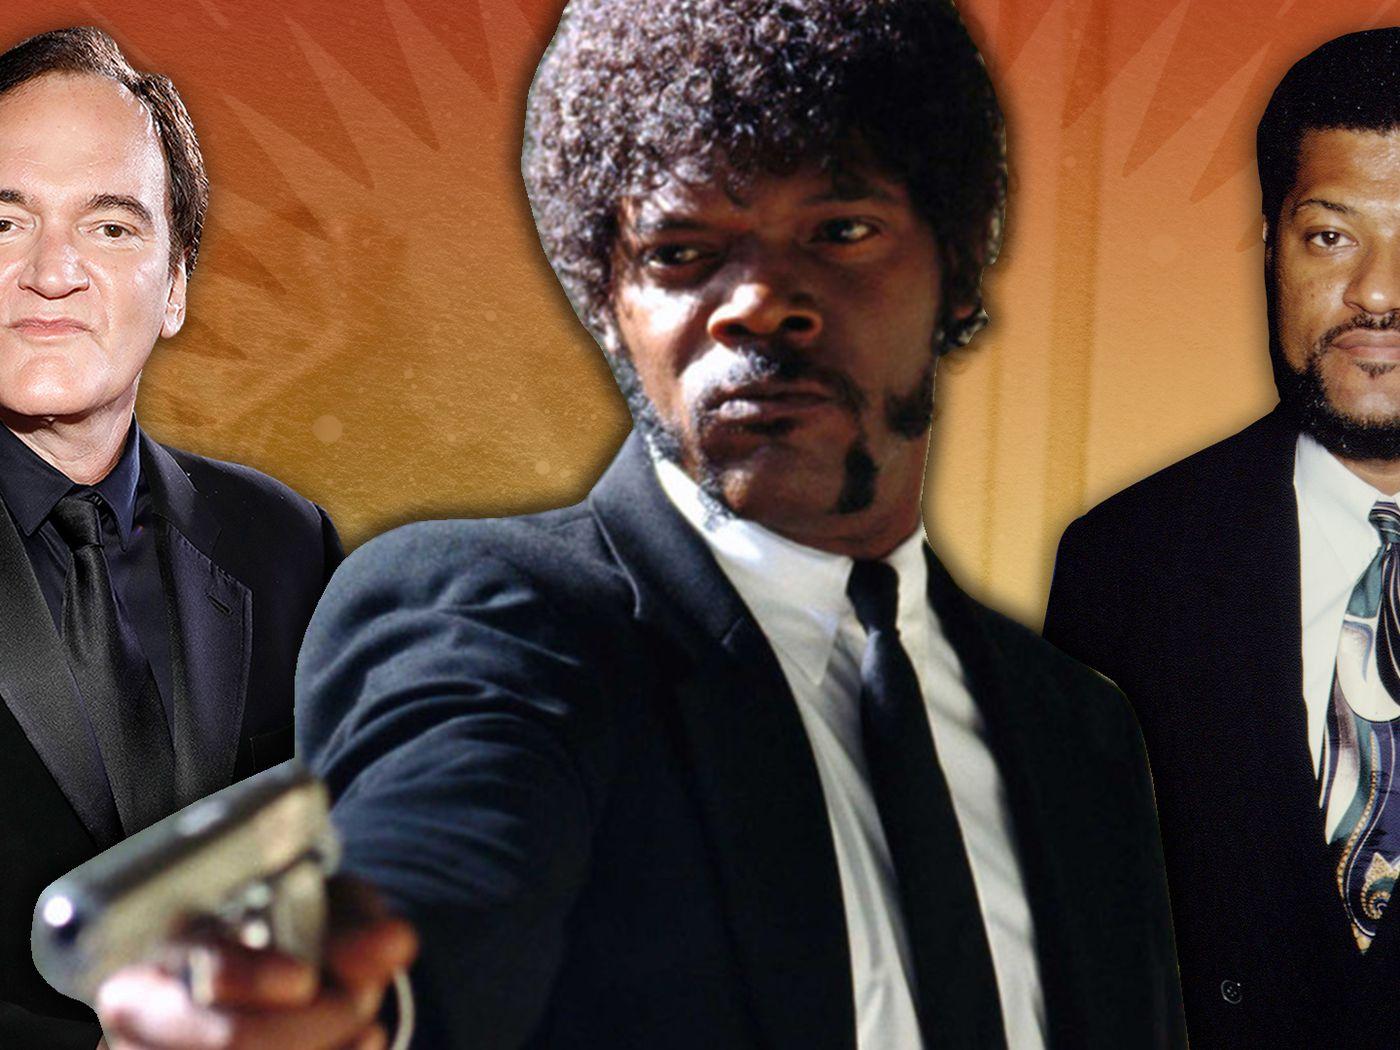 Laurence Fishburne Turned Down Samuel L. Jackson's 'Pulp Fiction' Role